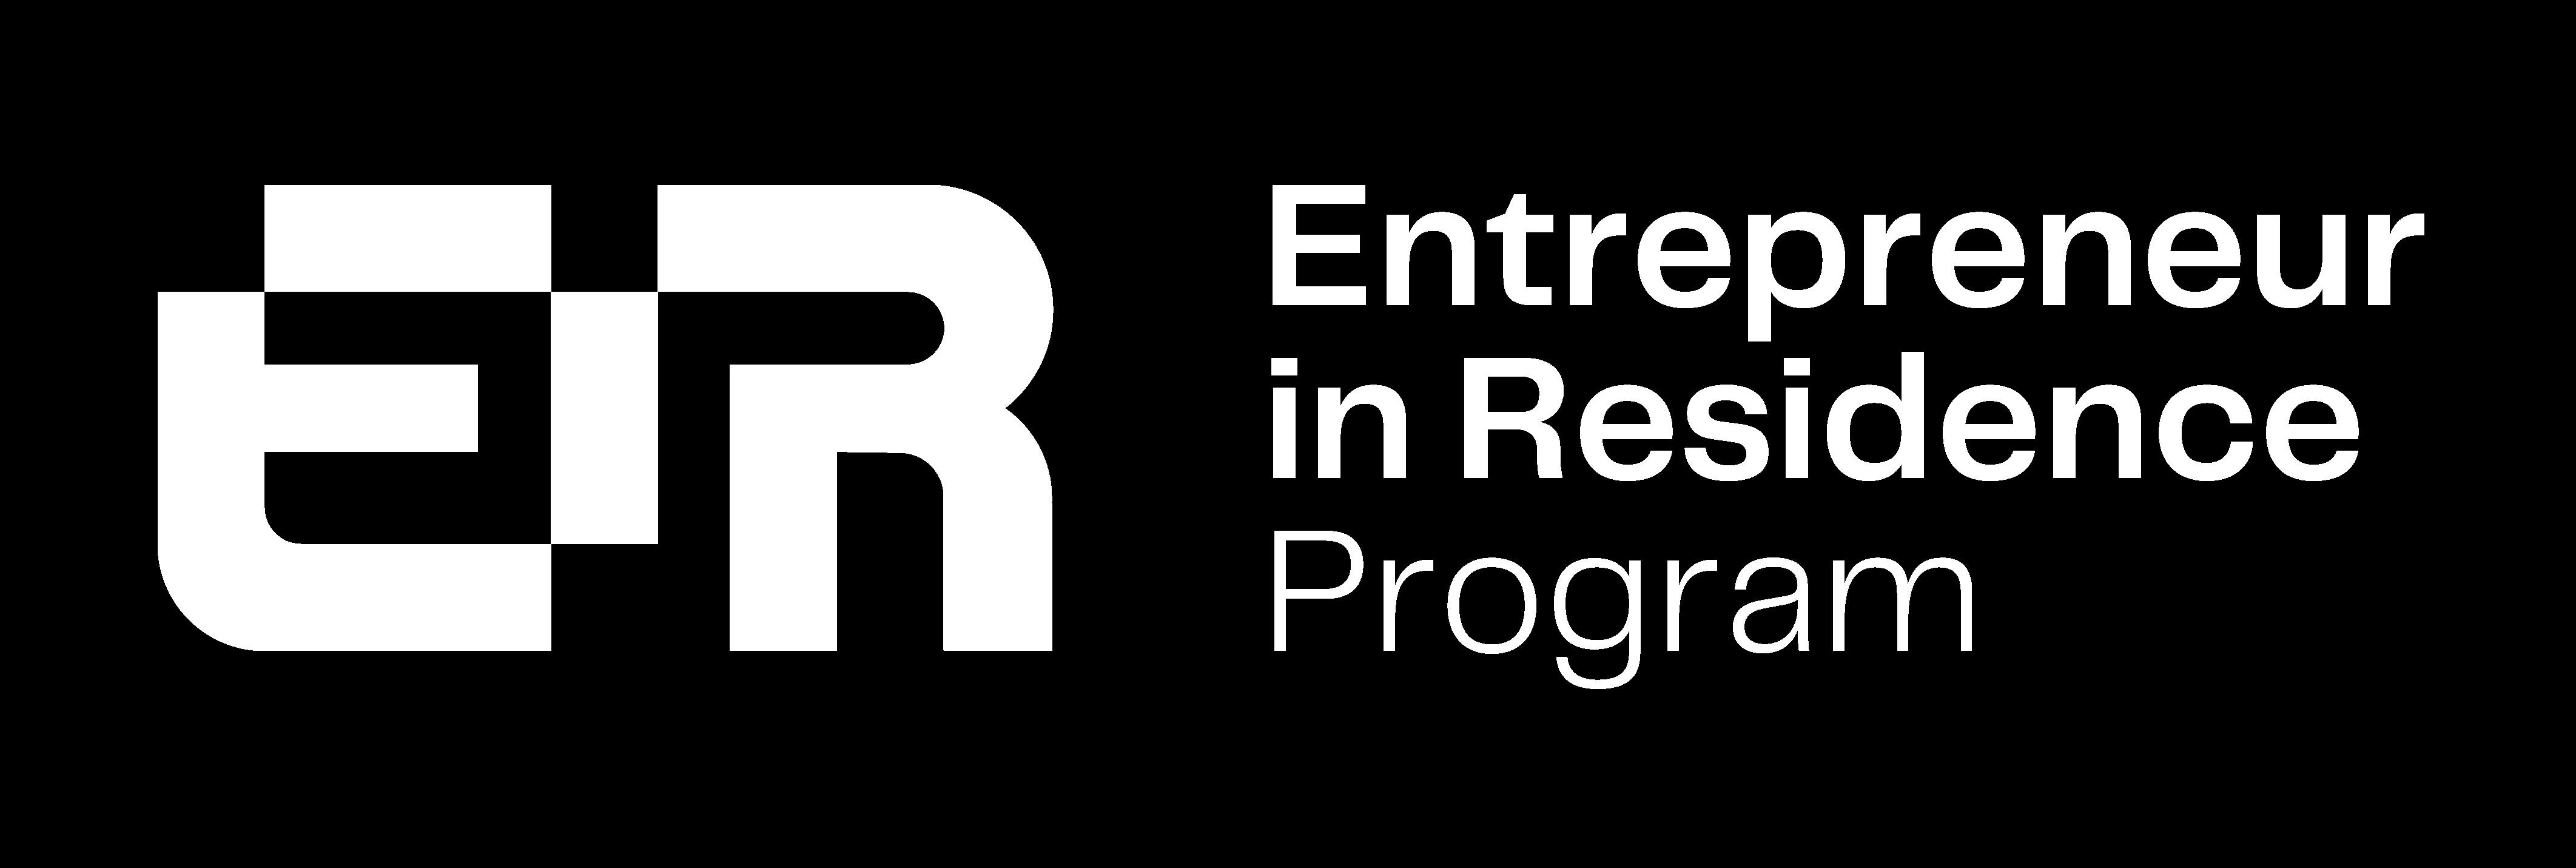 Entrepreneur in Residence Program by Next Big Thing AG